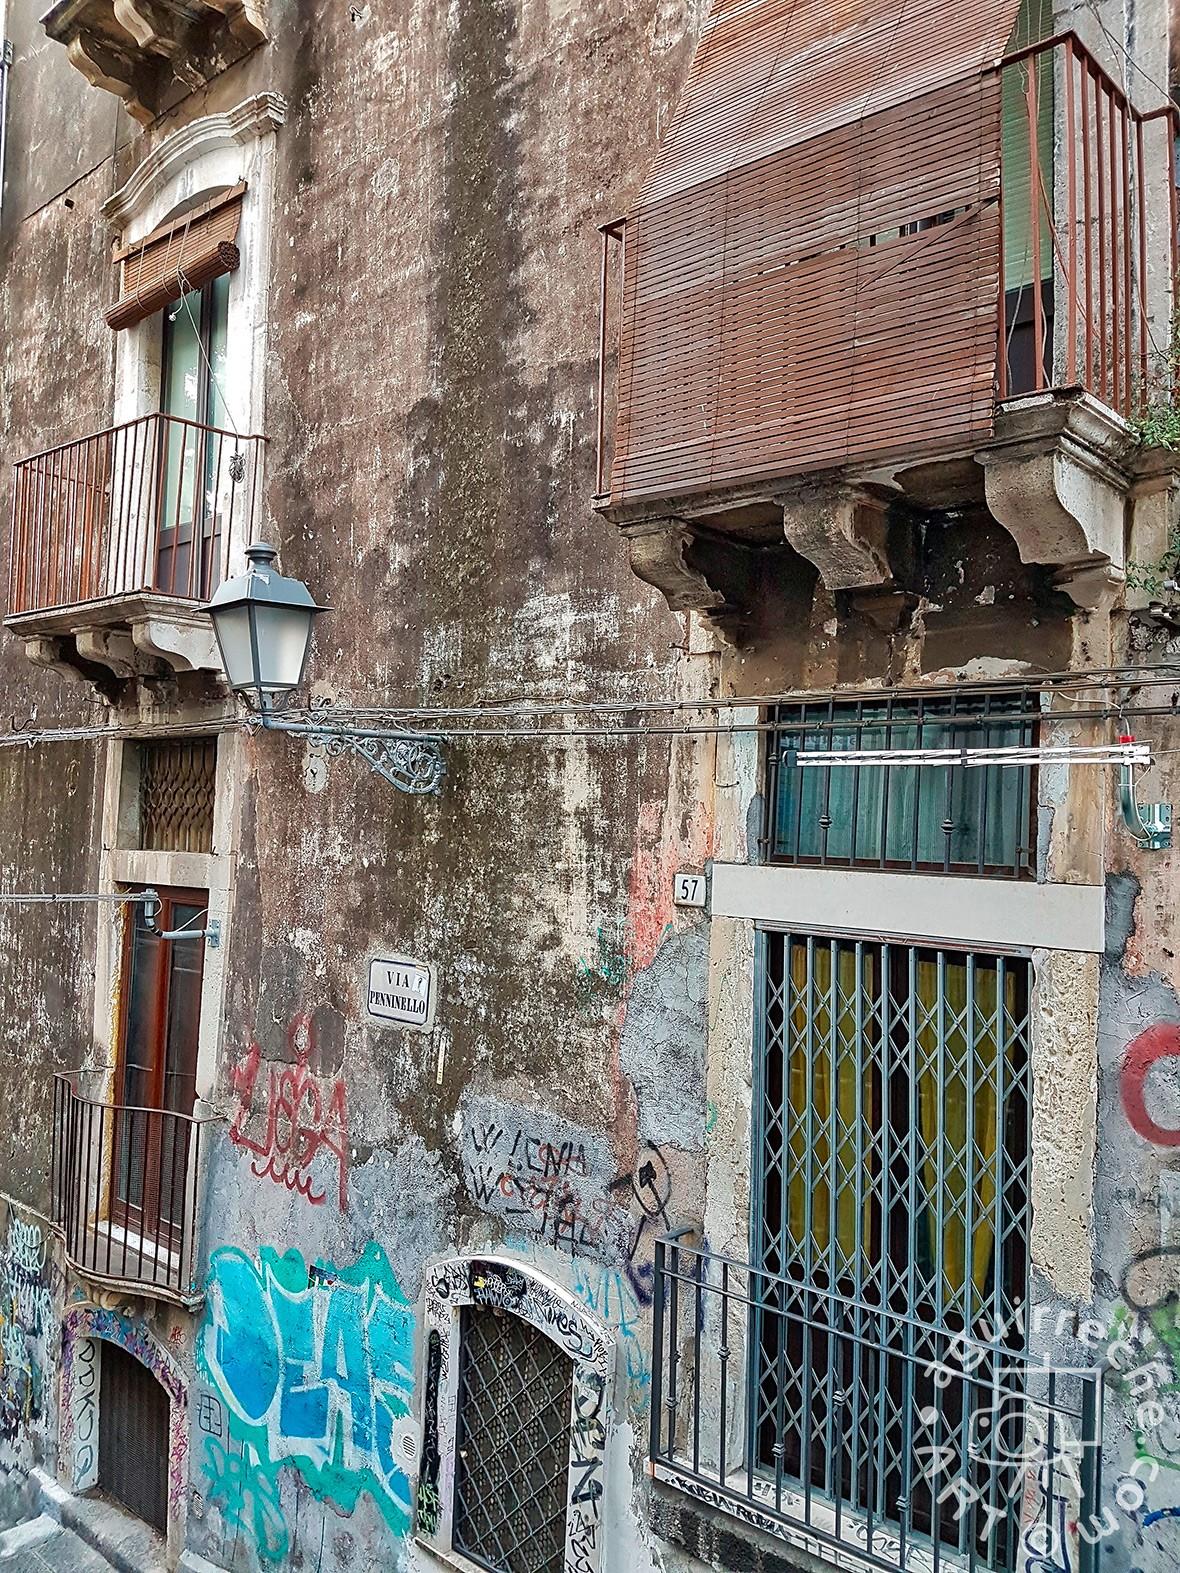 Fotografía arquitectura decadente, grafitis